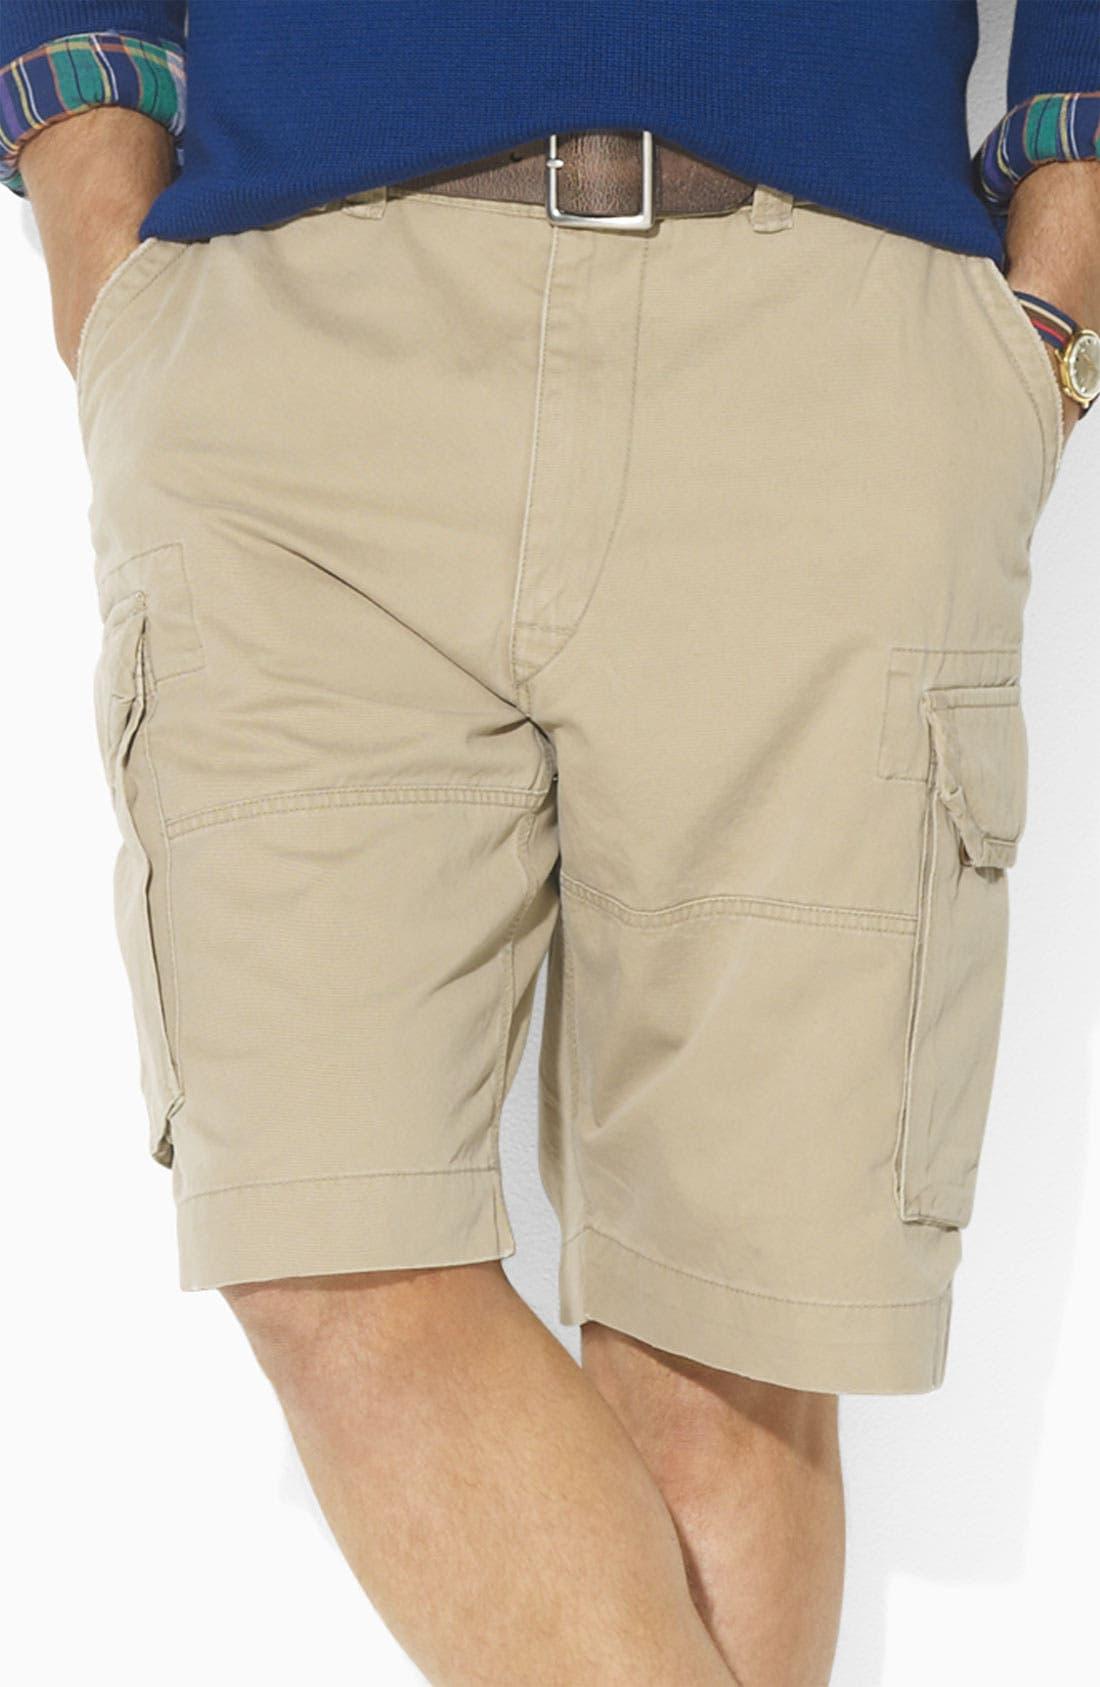 Alternate Image 1 Selected - Polo Ralph Lauren 'Gellar' Fatigue Cargo Shorts (Big & Tall)